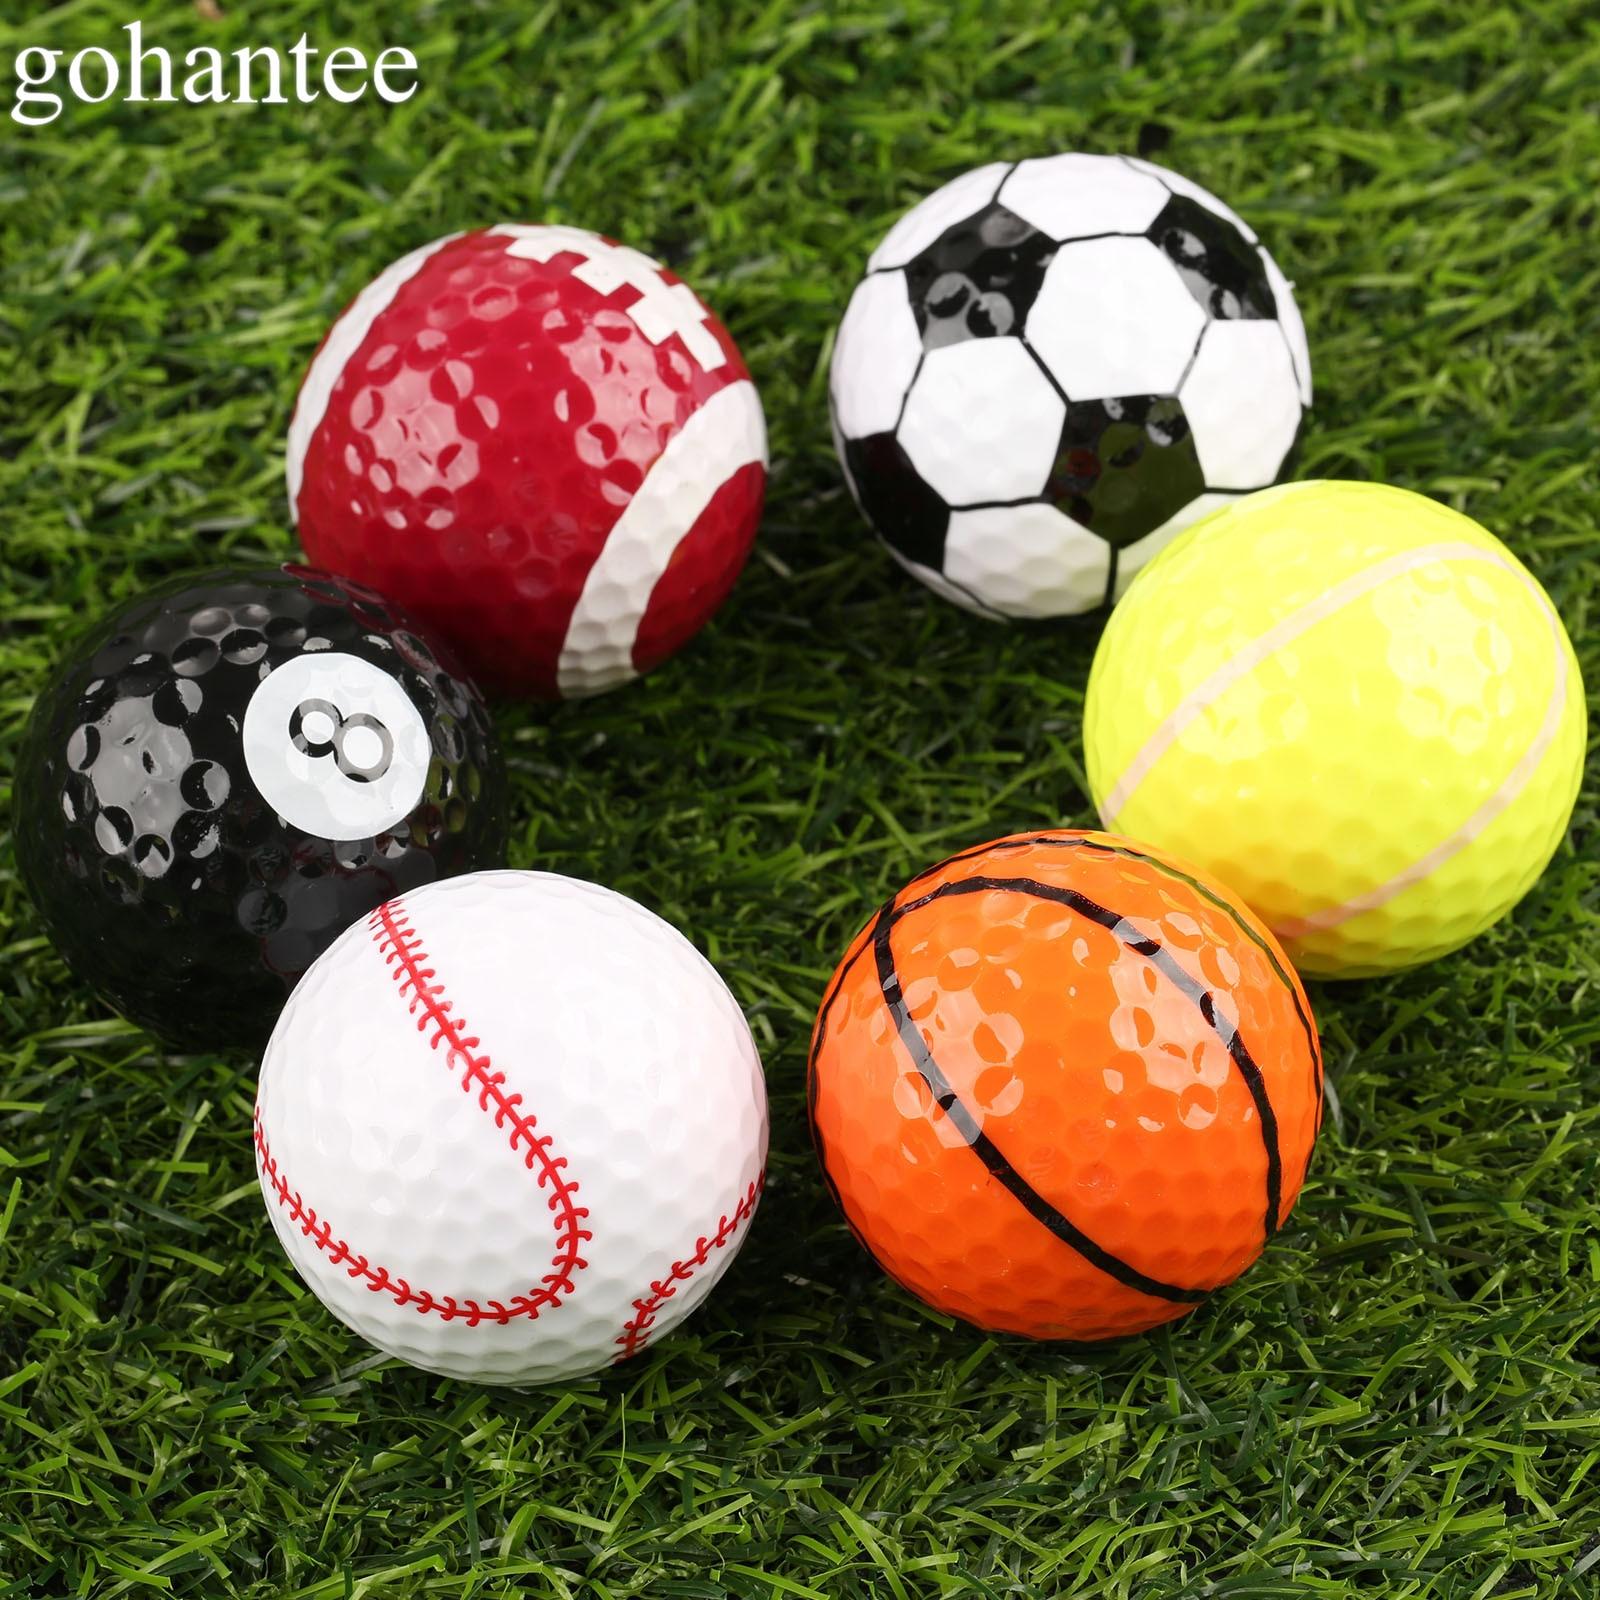 Gohantee Novelty Creative Rubber Golf Balls 6 Kinds Of Pattern Golf Game Balls Similar Rugby Football Sports Champion Golf Balls